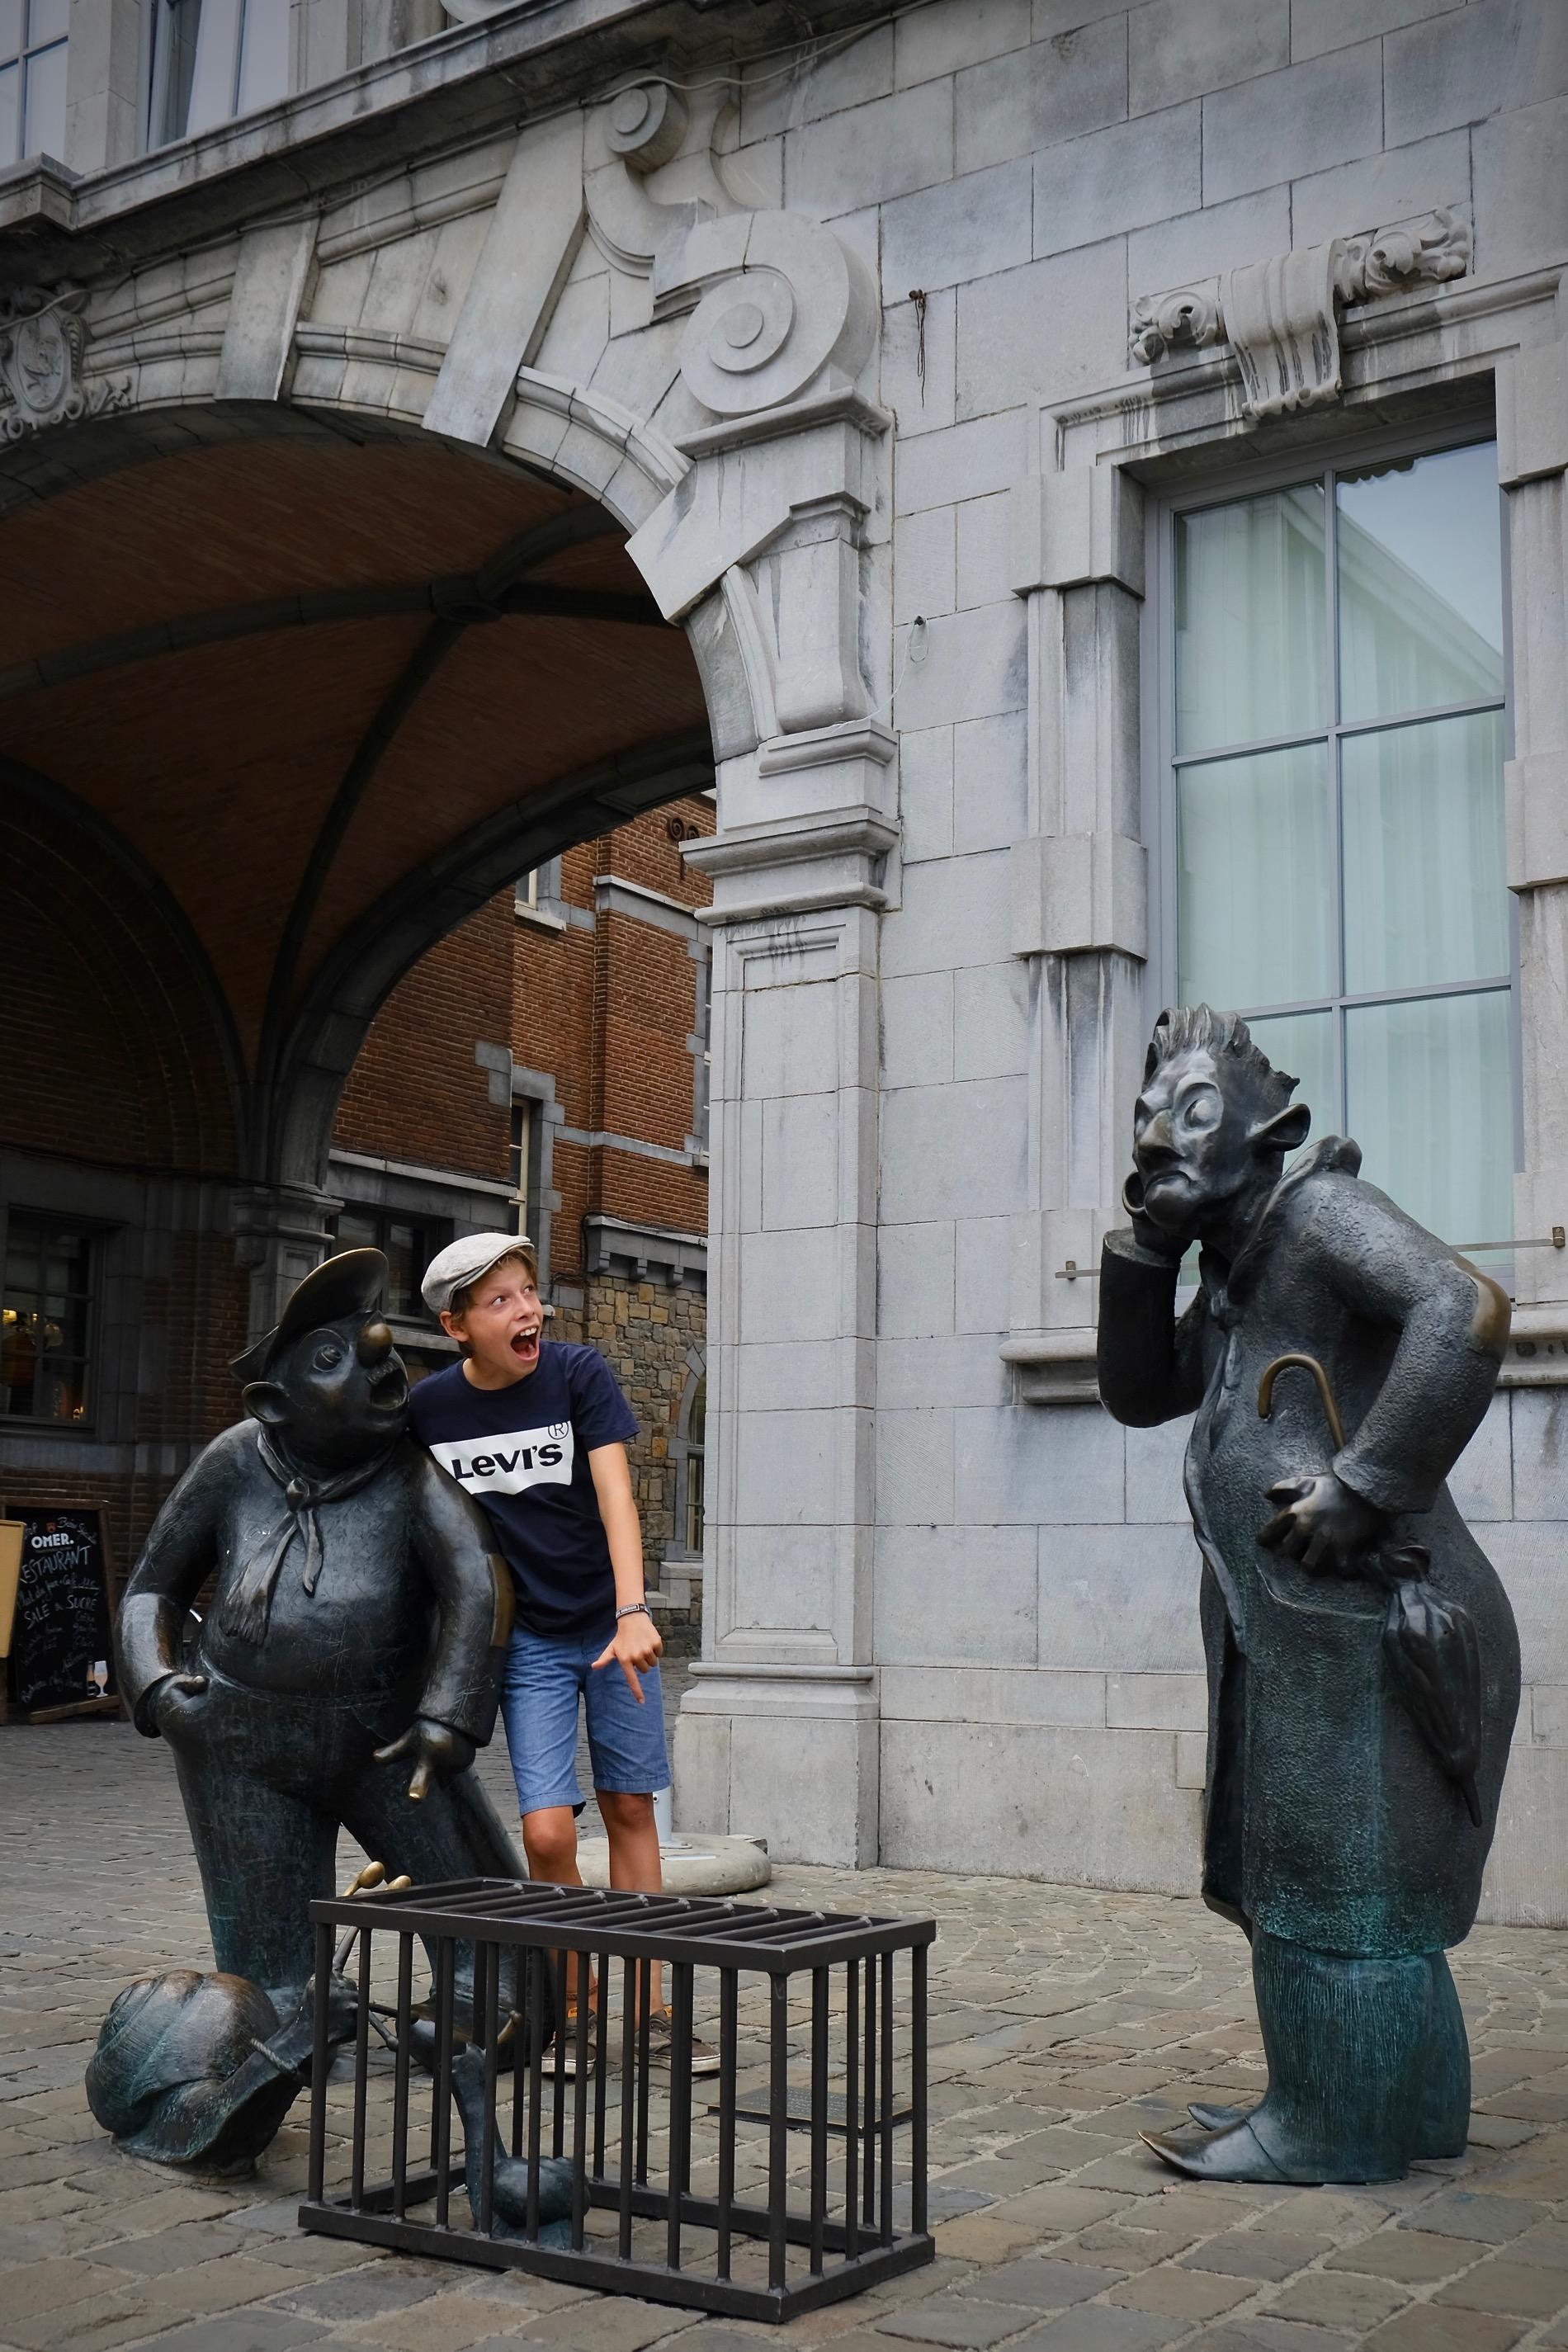 Namen de hoofdstad van Wallonië